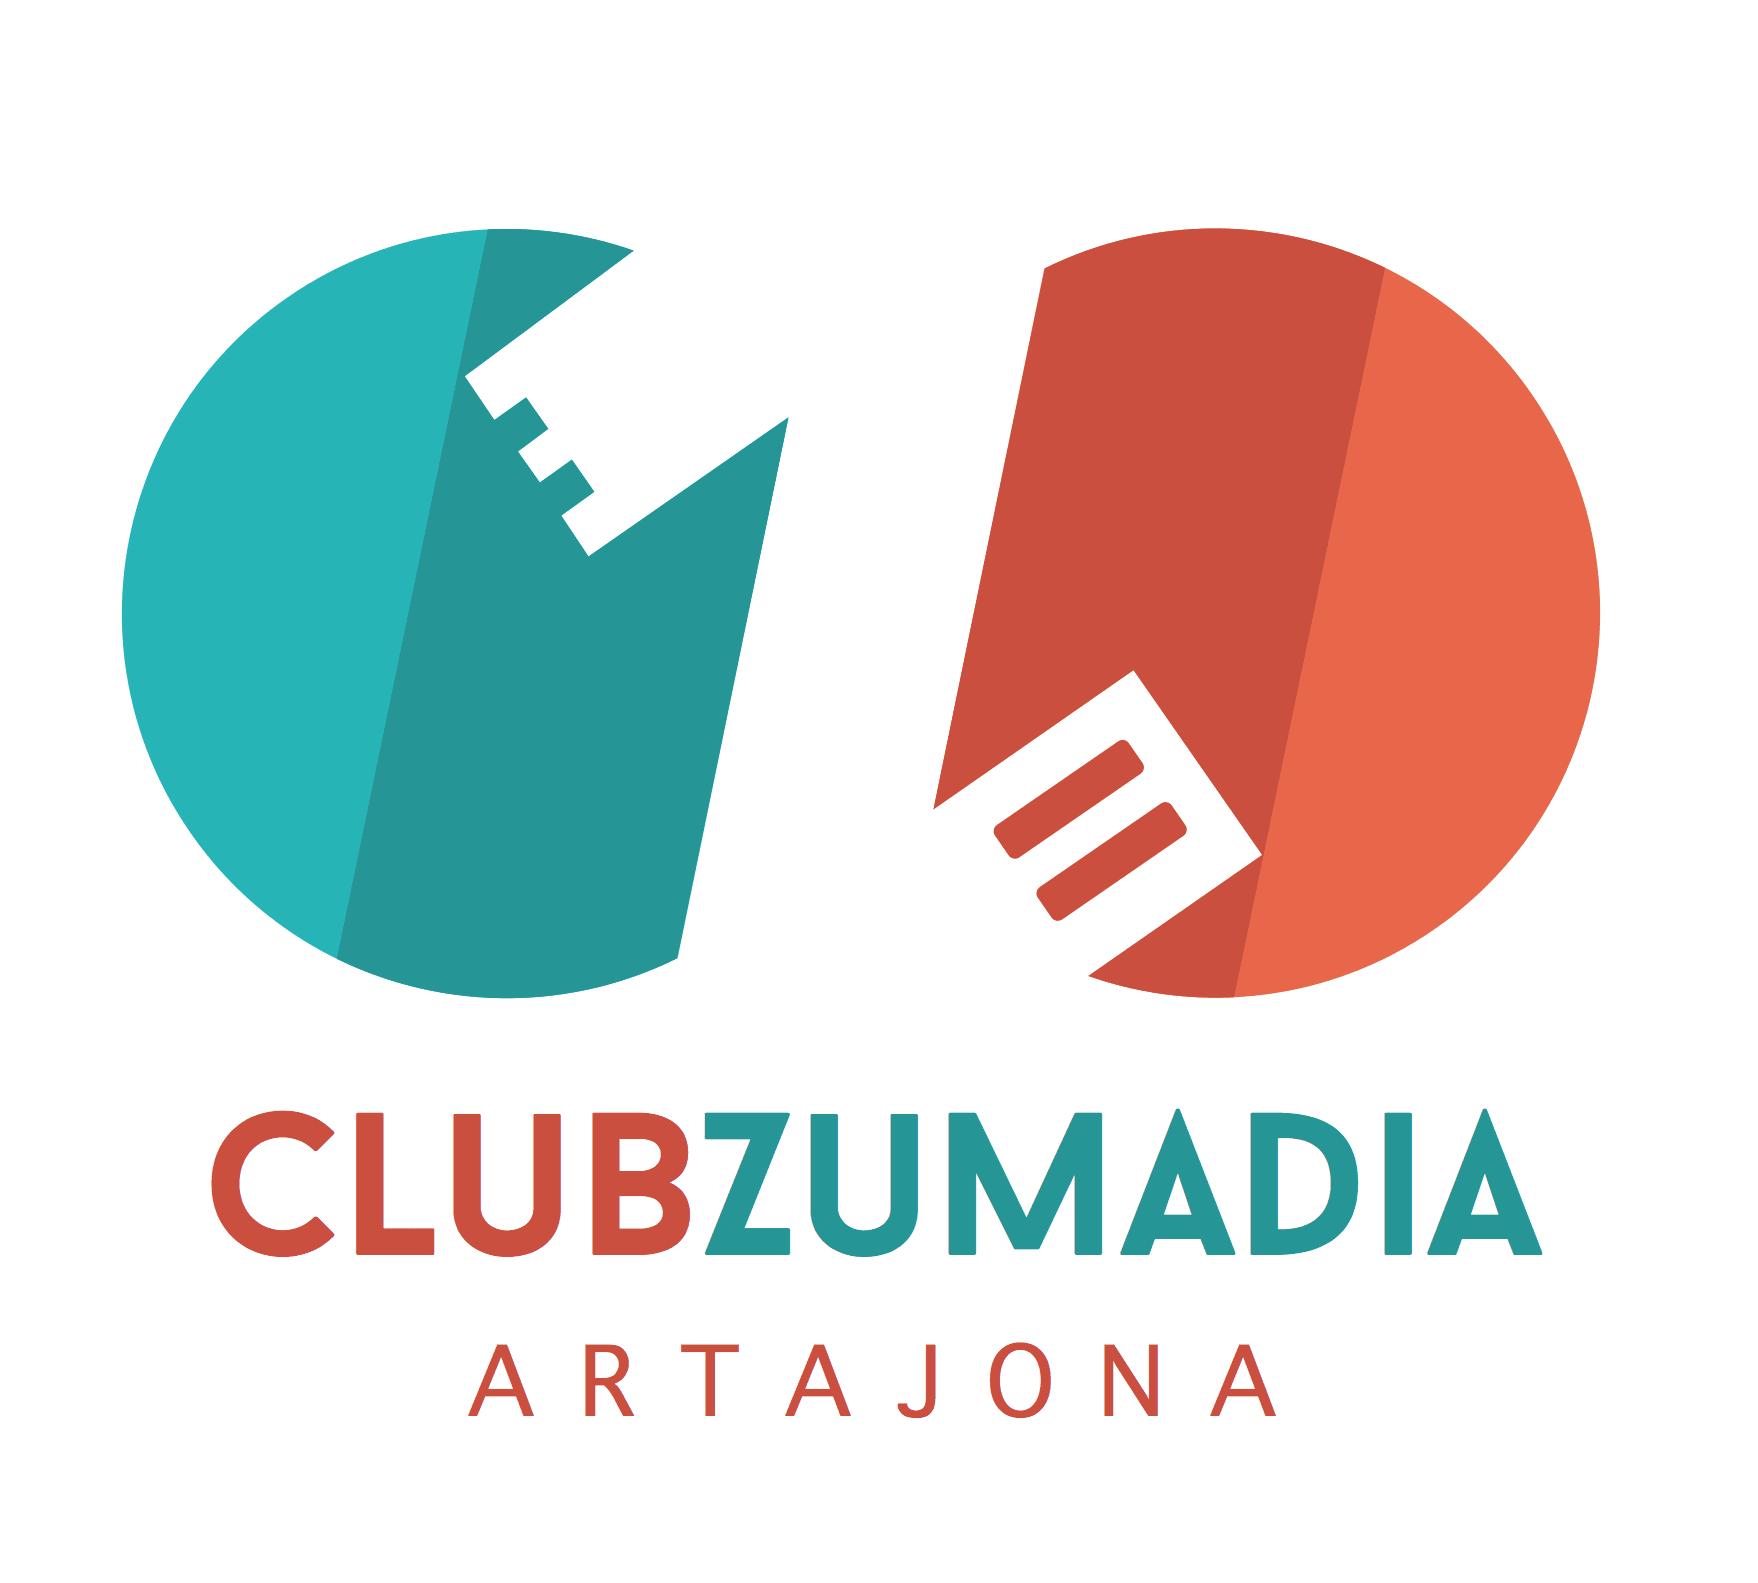 CD  ZUMADIA